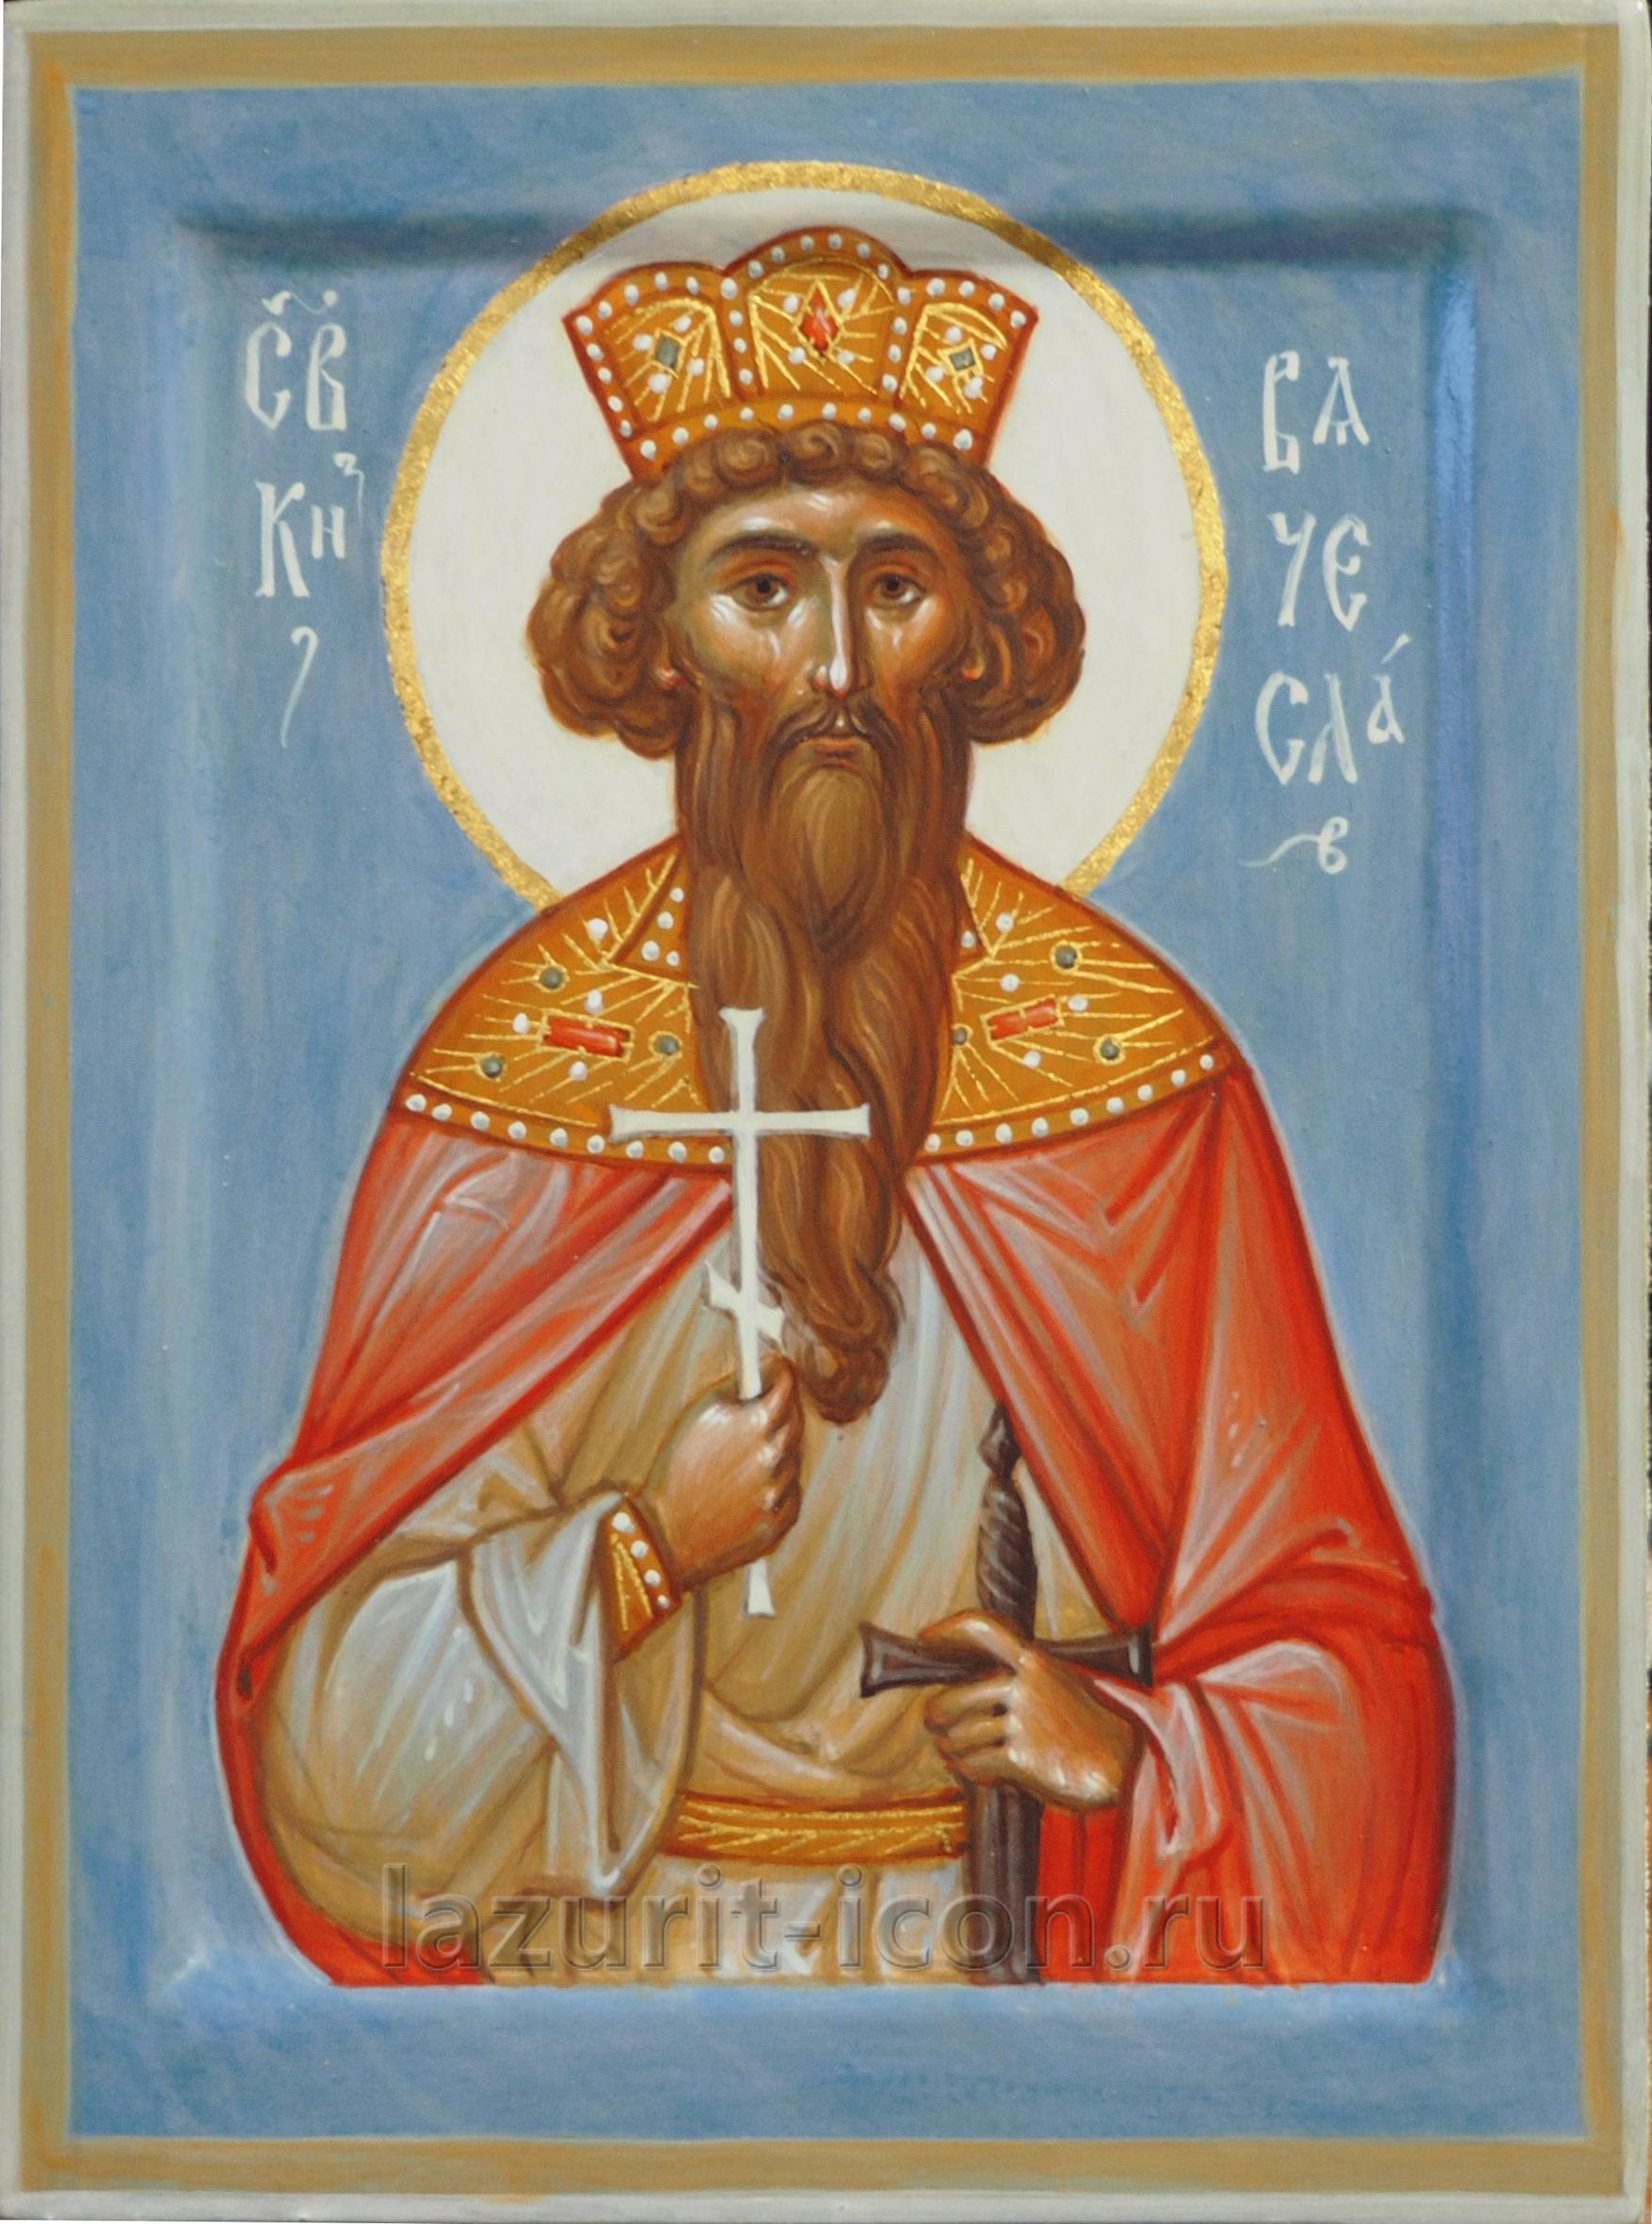 святой князь Вячеслав